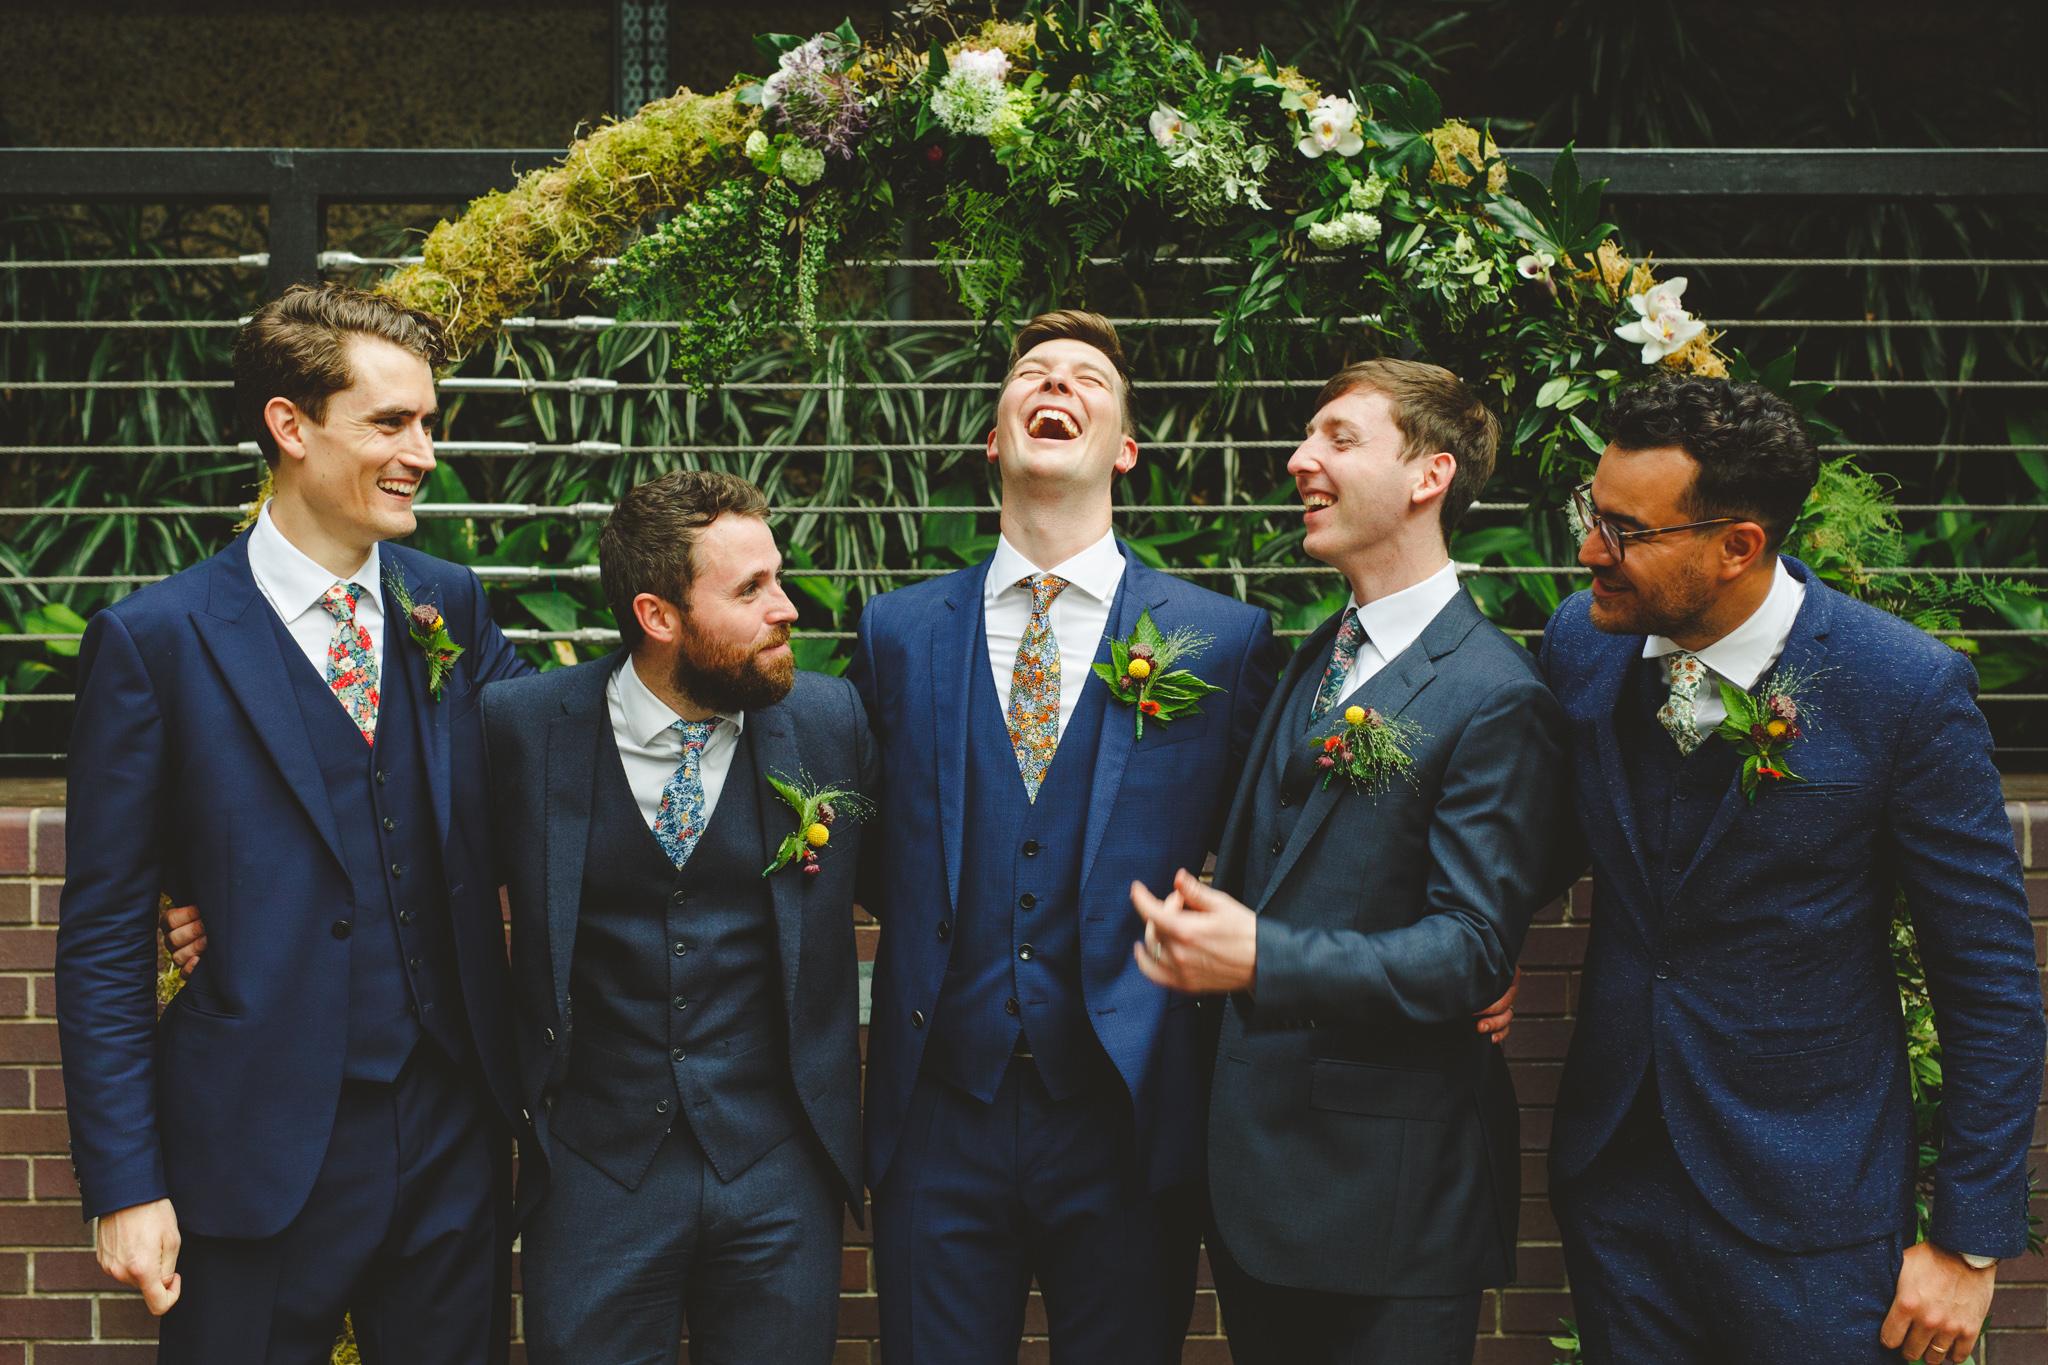 derbyshire-wedding-photographer-videographer-camera-hannah-15.jpg